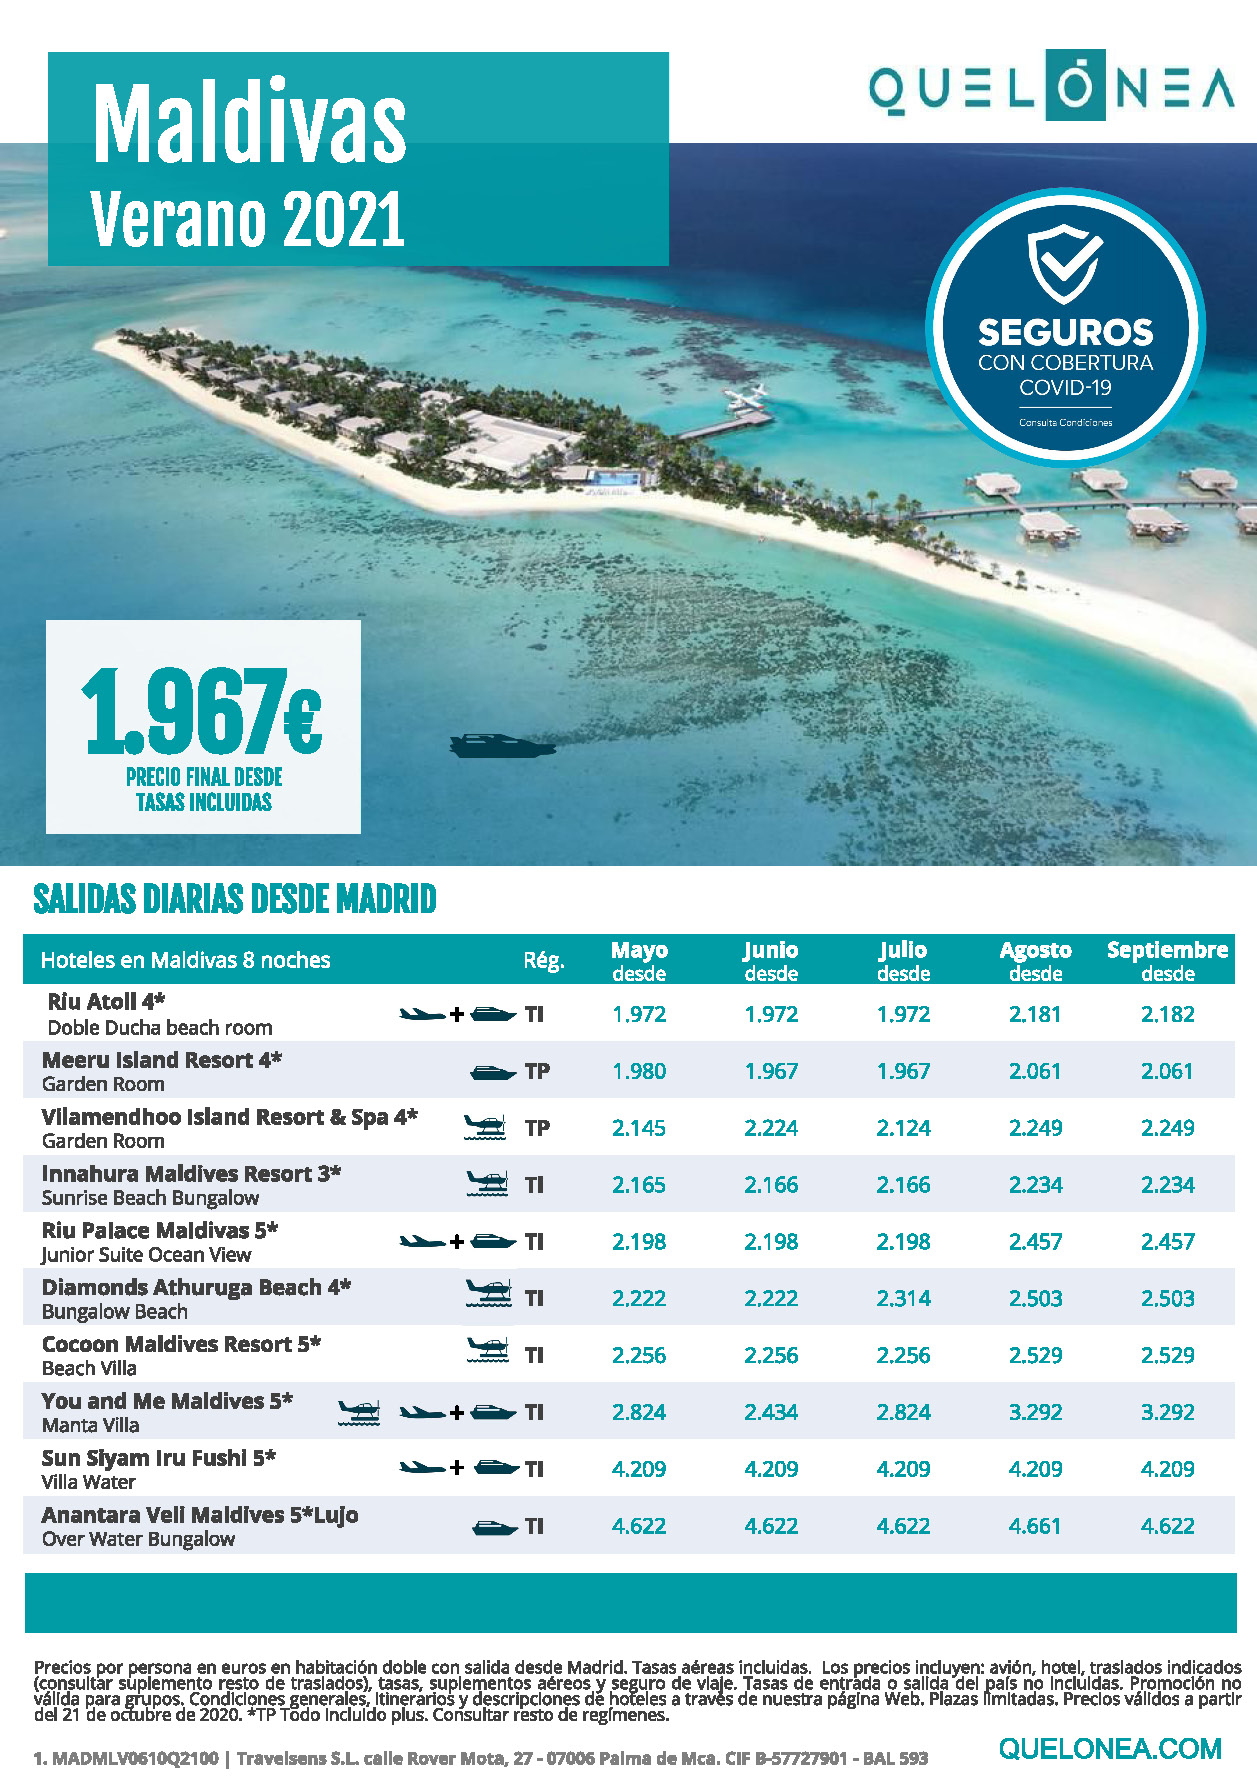 Ofertas Quelonea Maldivas Verano 2021